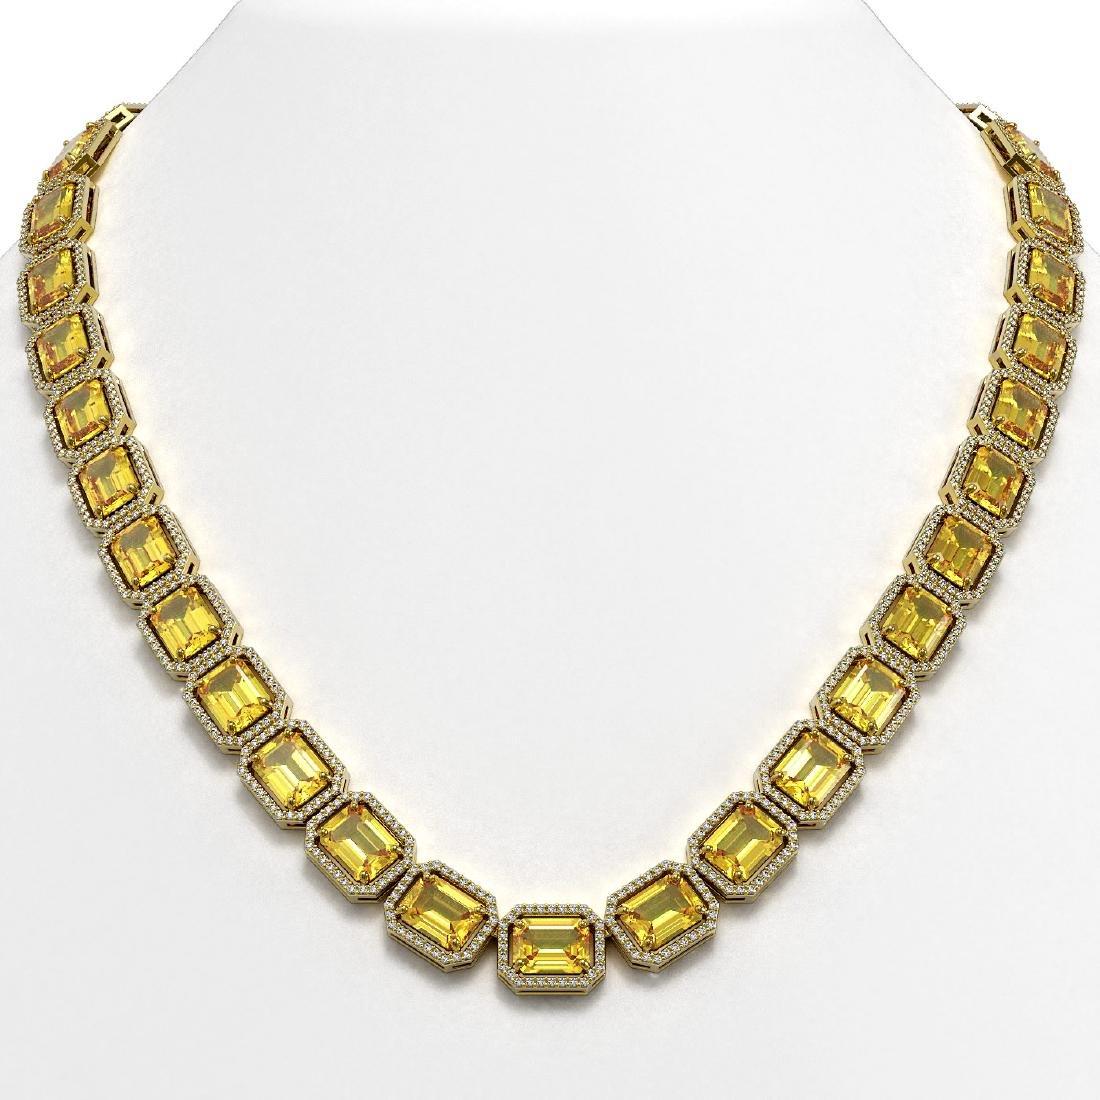 77.35 CTW Fancy Citrine & Diamond Halo Necklace 10K